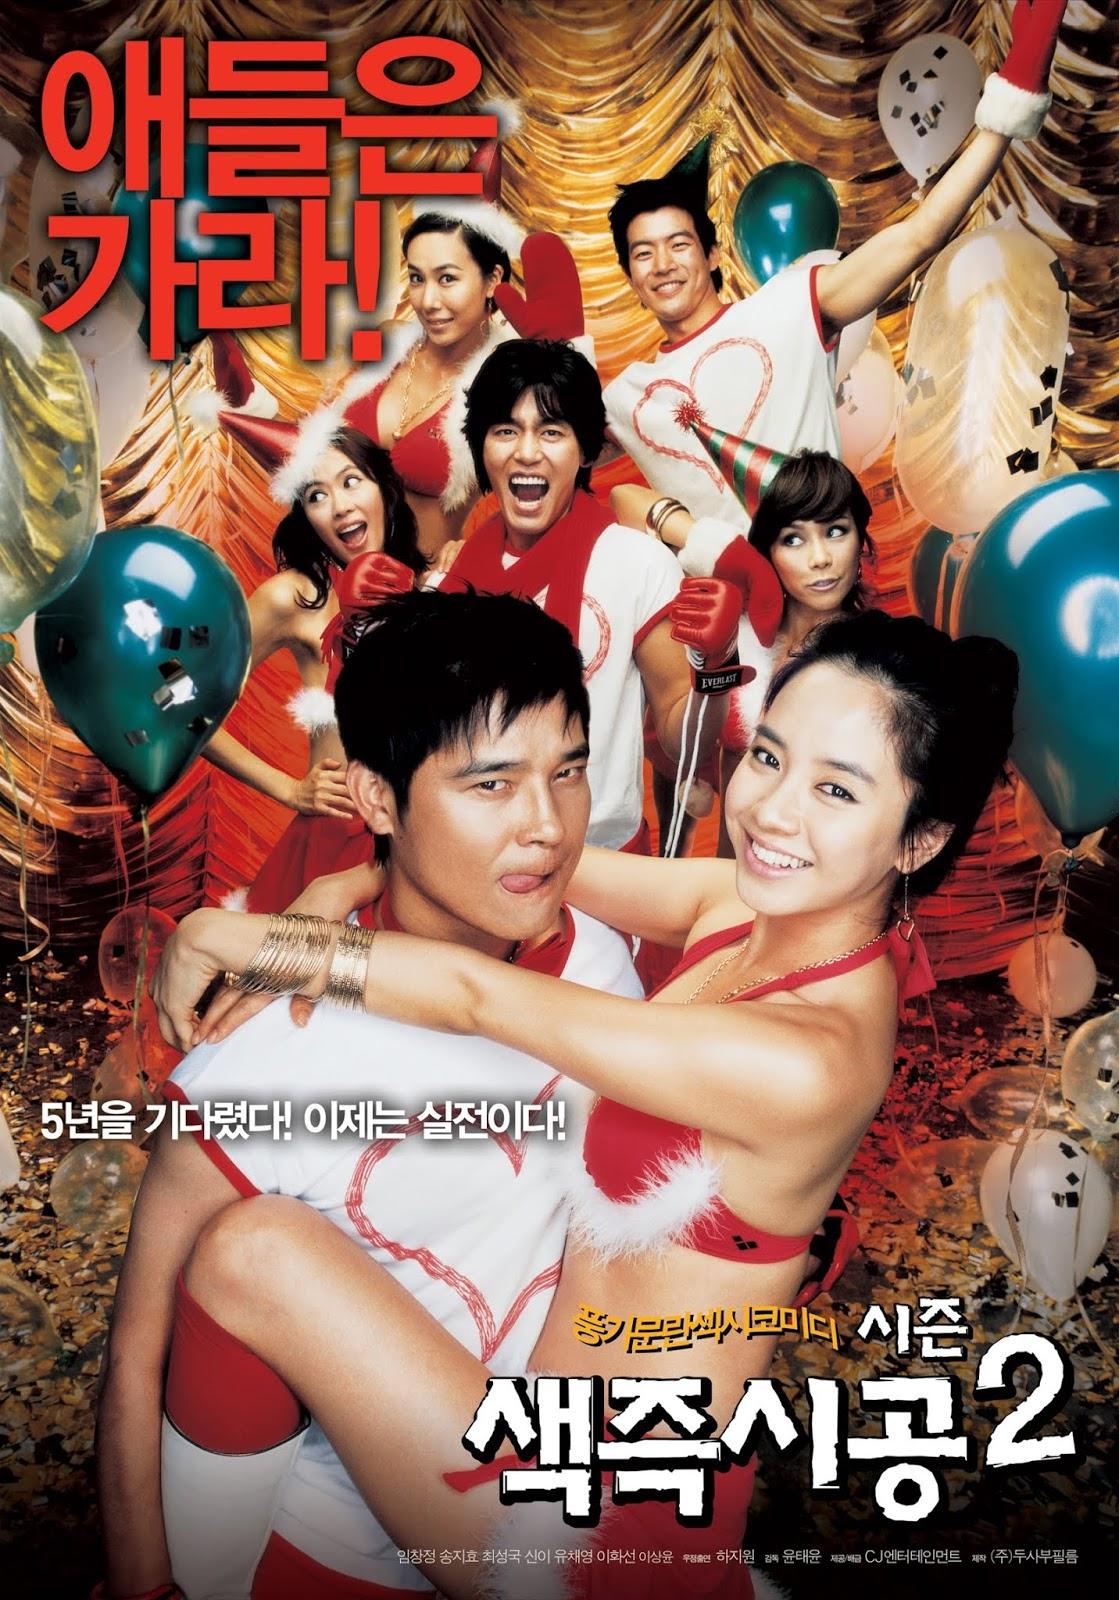 Sex Is Zero 2 Full Korea 18+ Adult Movie Online Free